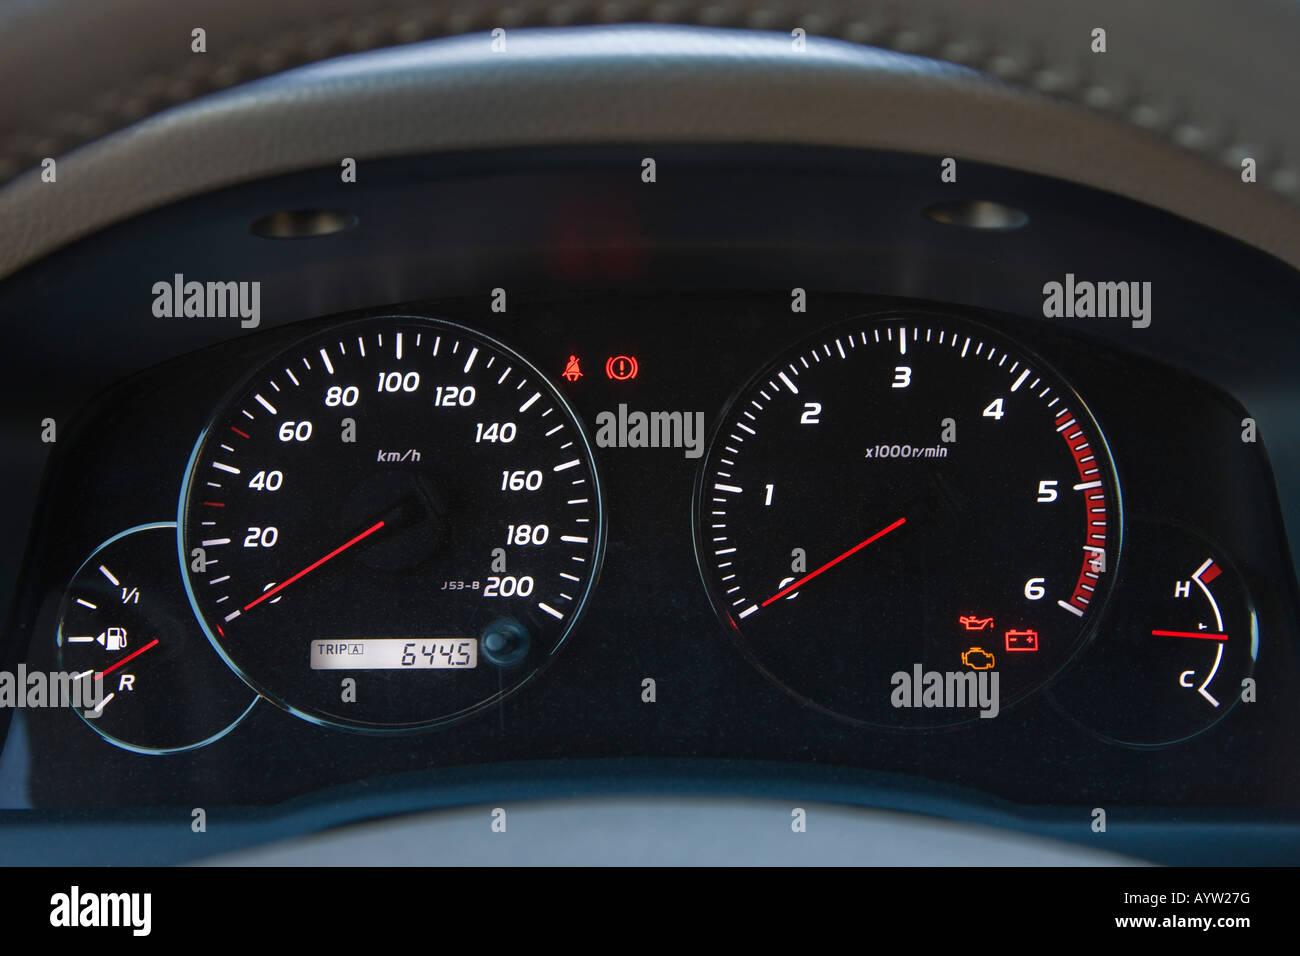 Instrument panel of modern automobile Stock Photo: 17182899 - Alamy